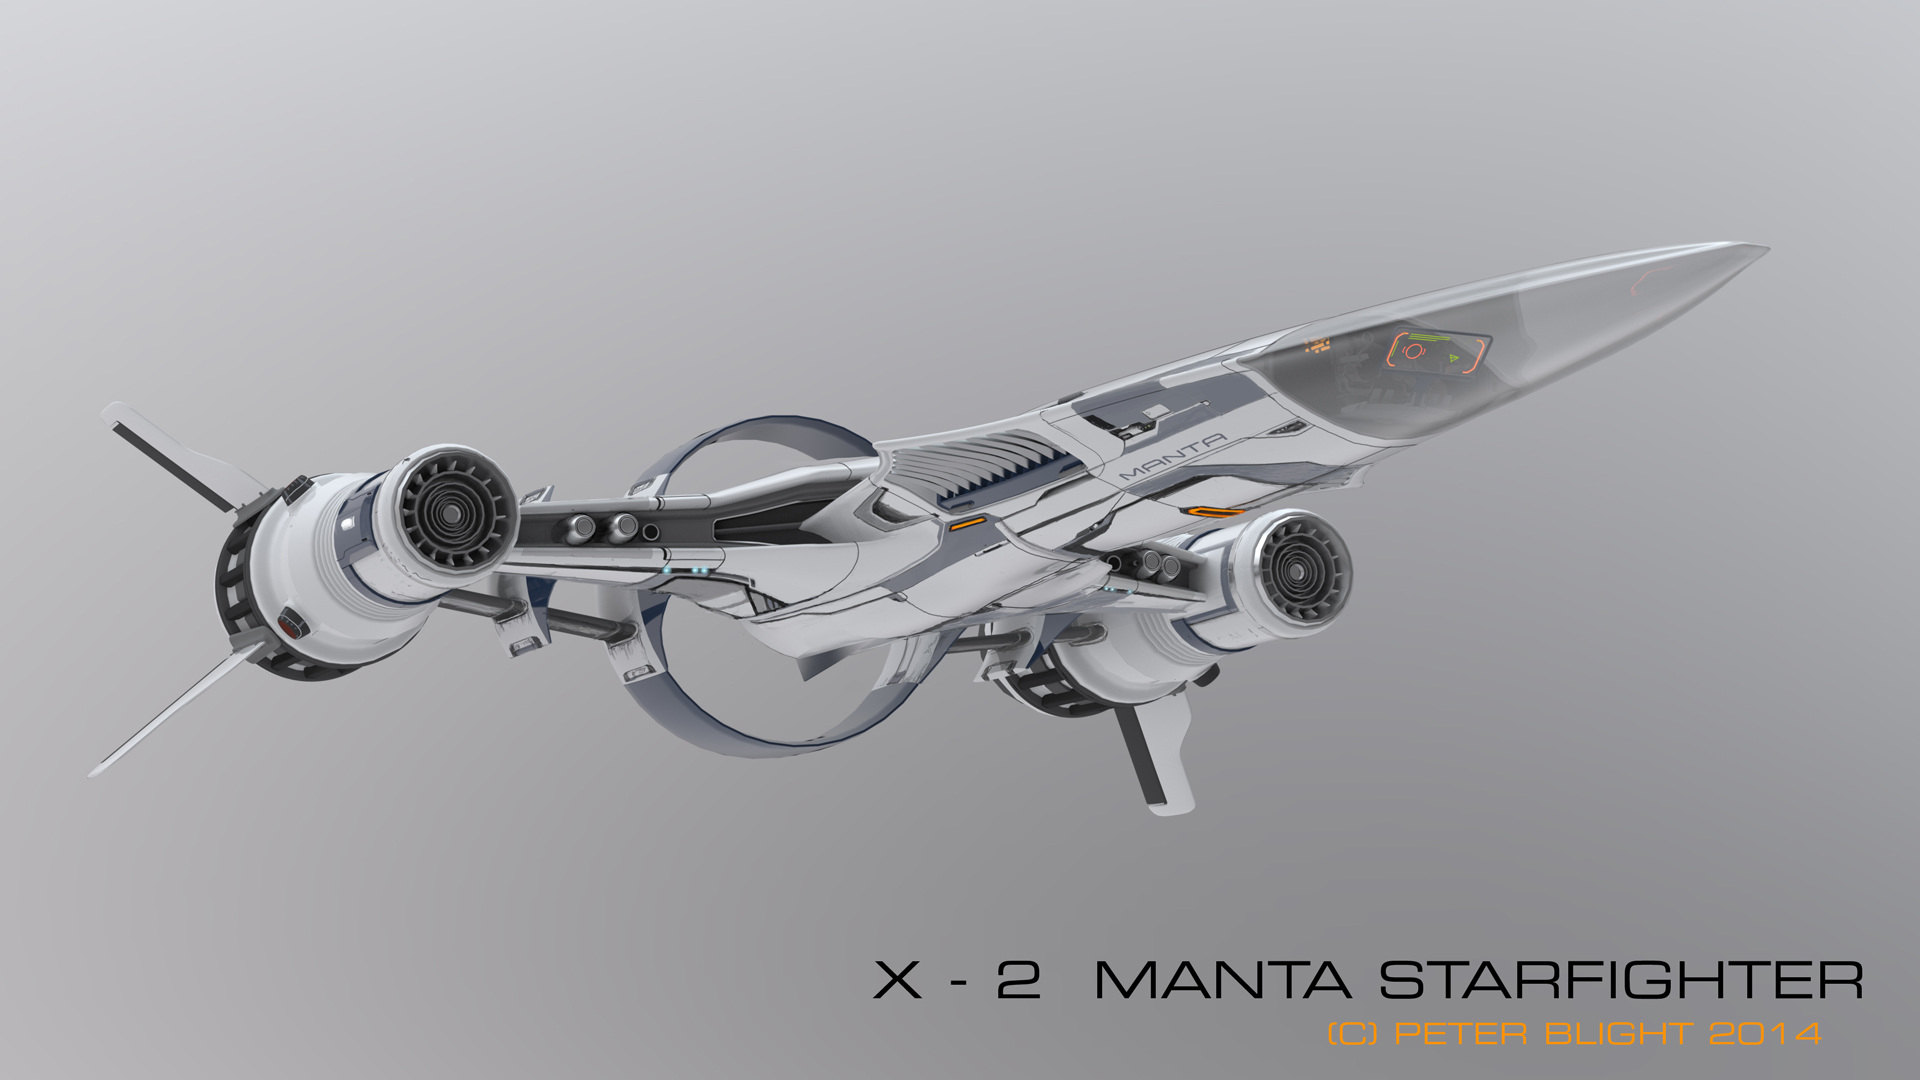 X2MANTAPaintoverC_1920.jpg